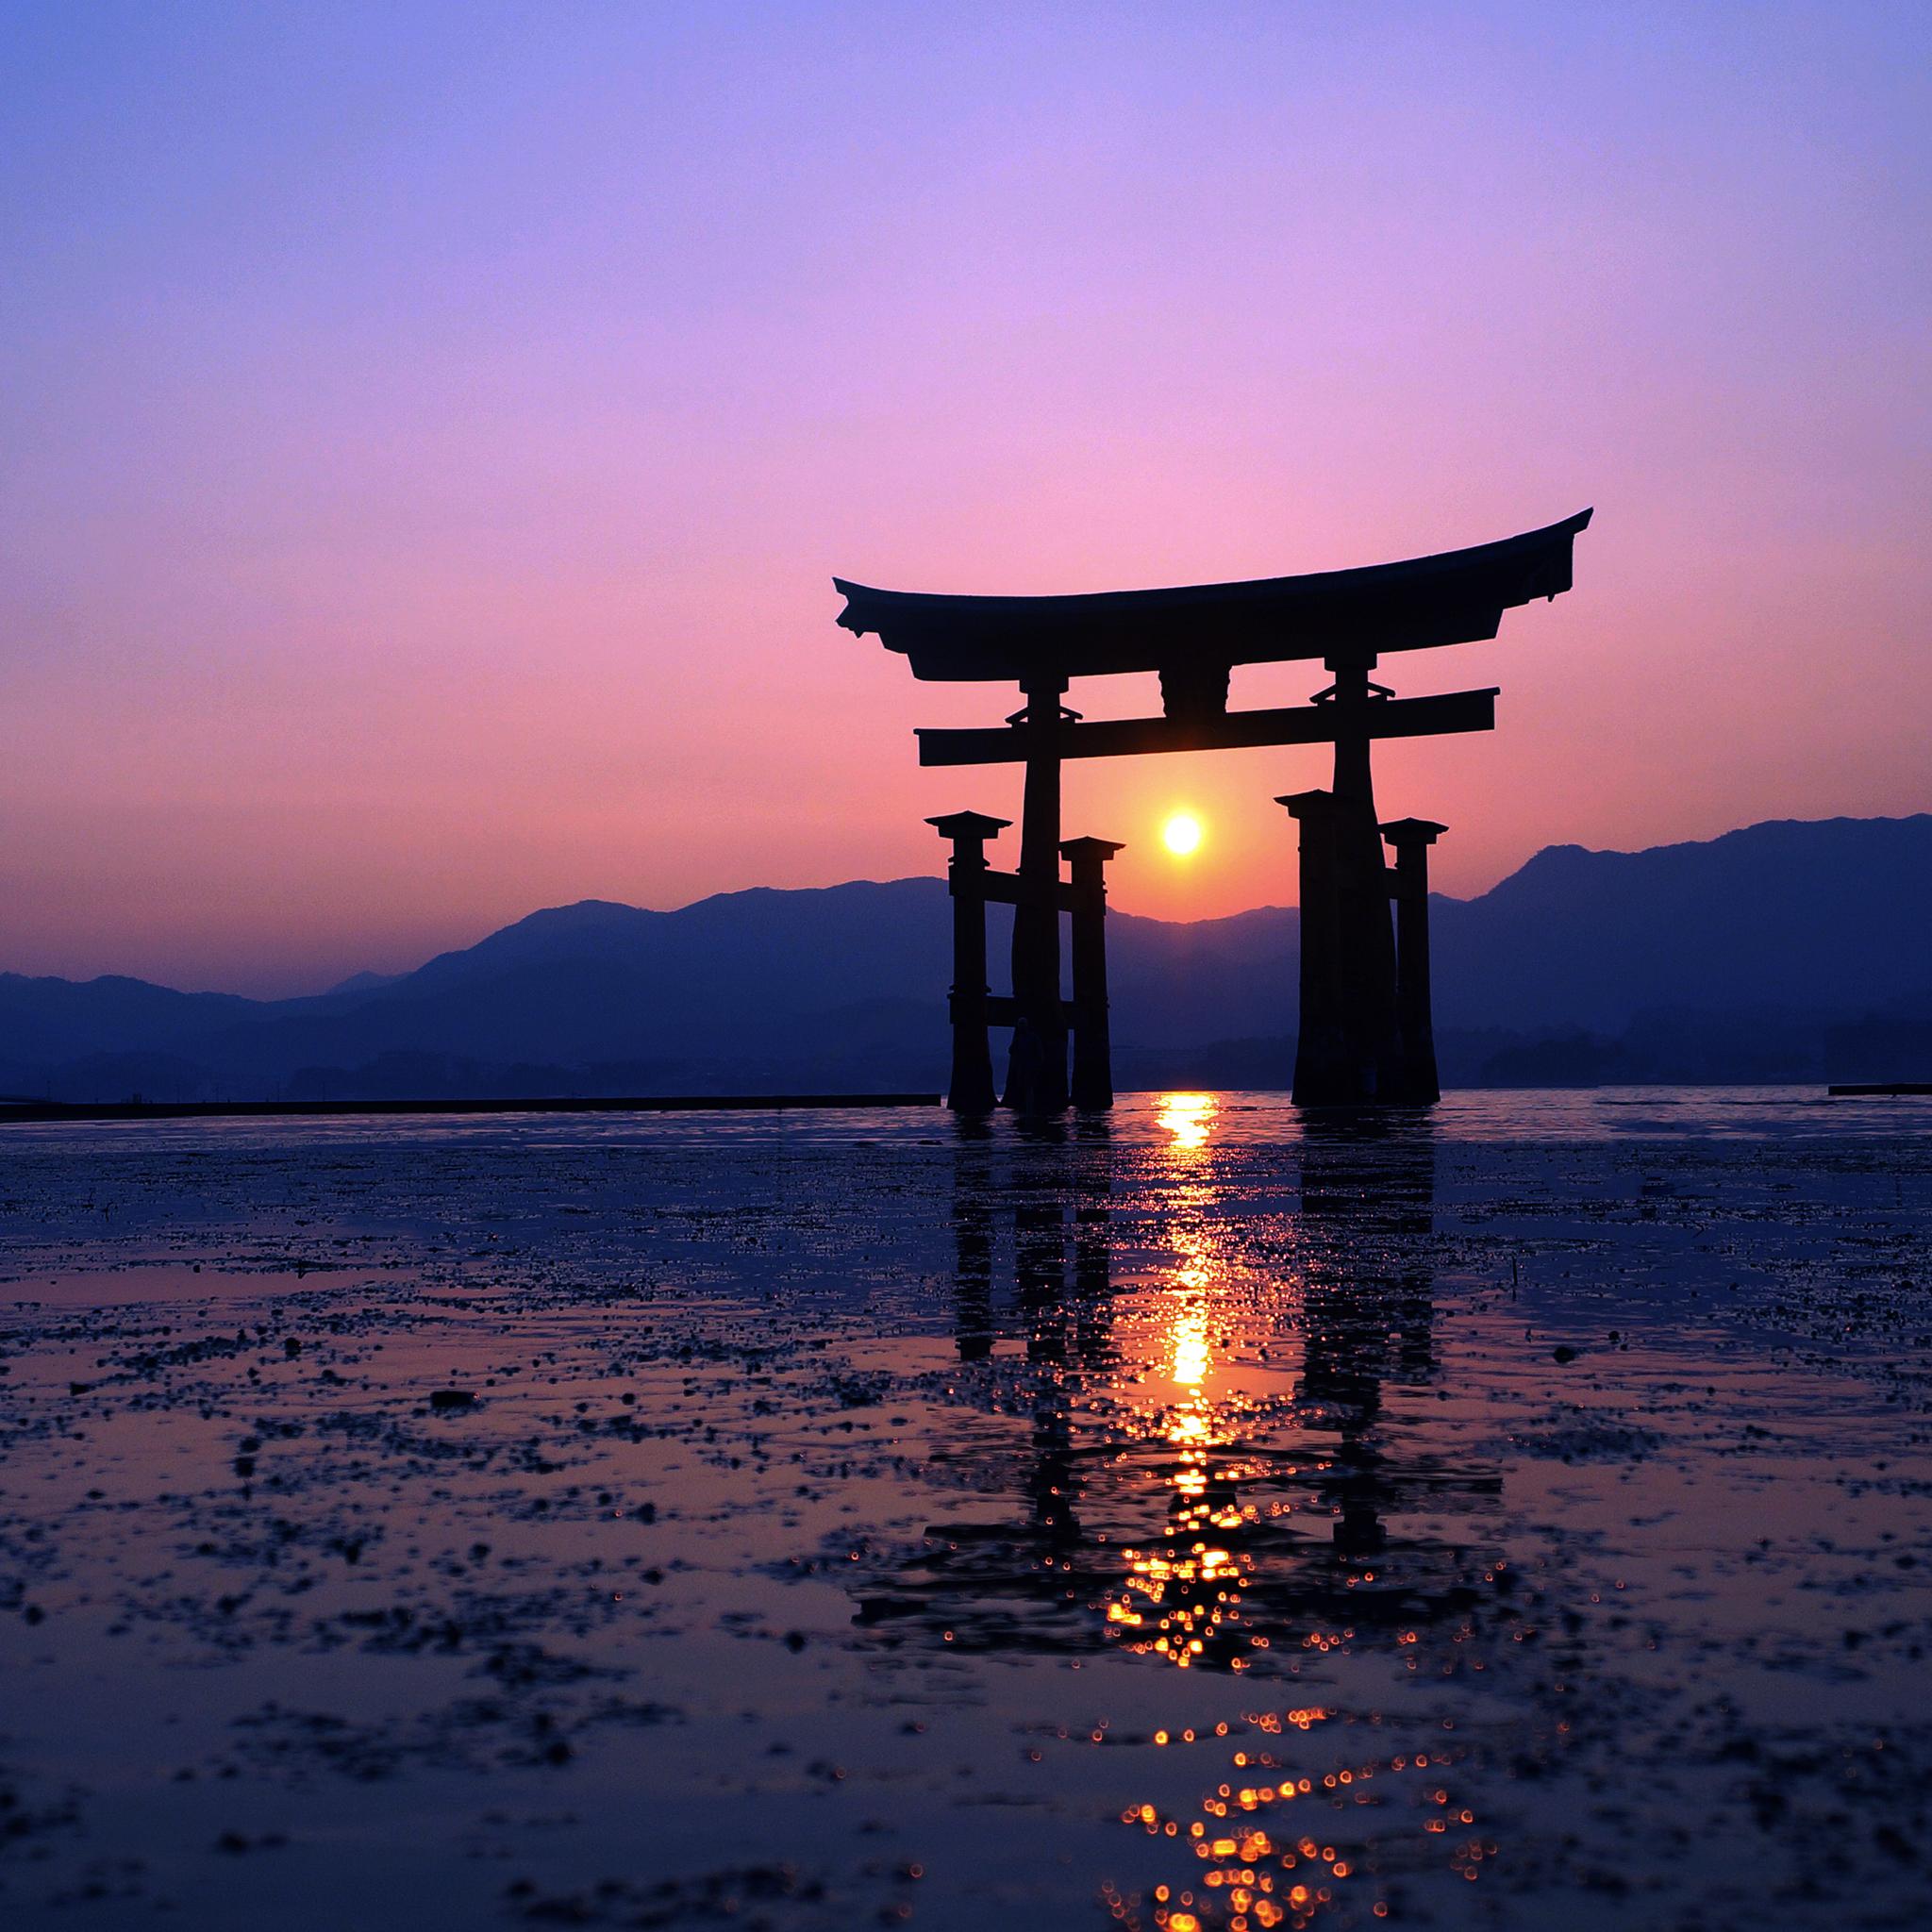 2048x2048 Japan Sunset Purple Evening 4k Ipad Air HD 4k